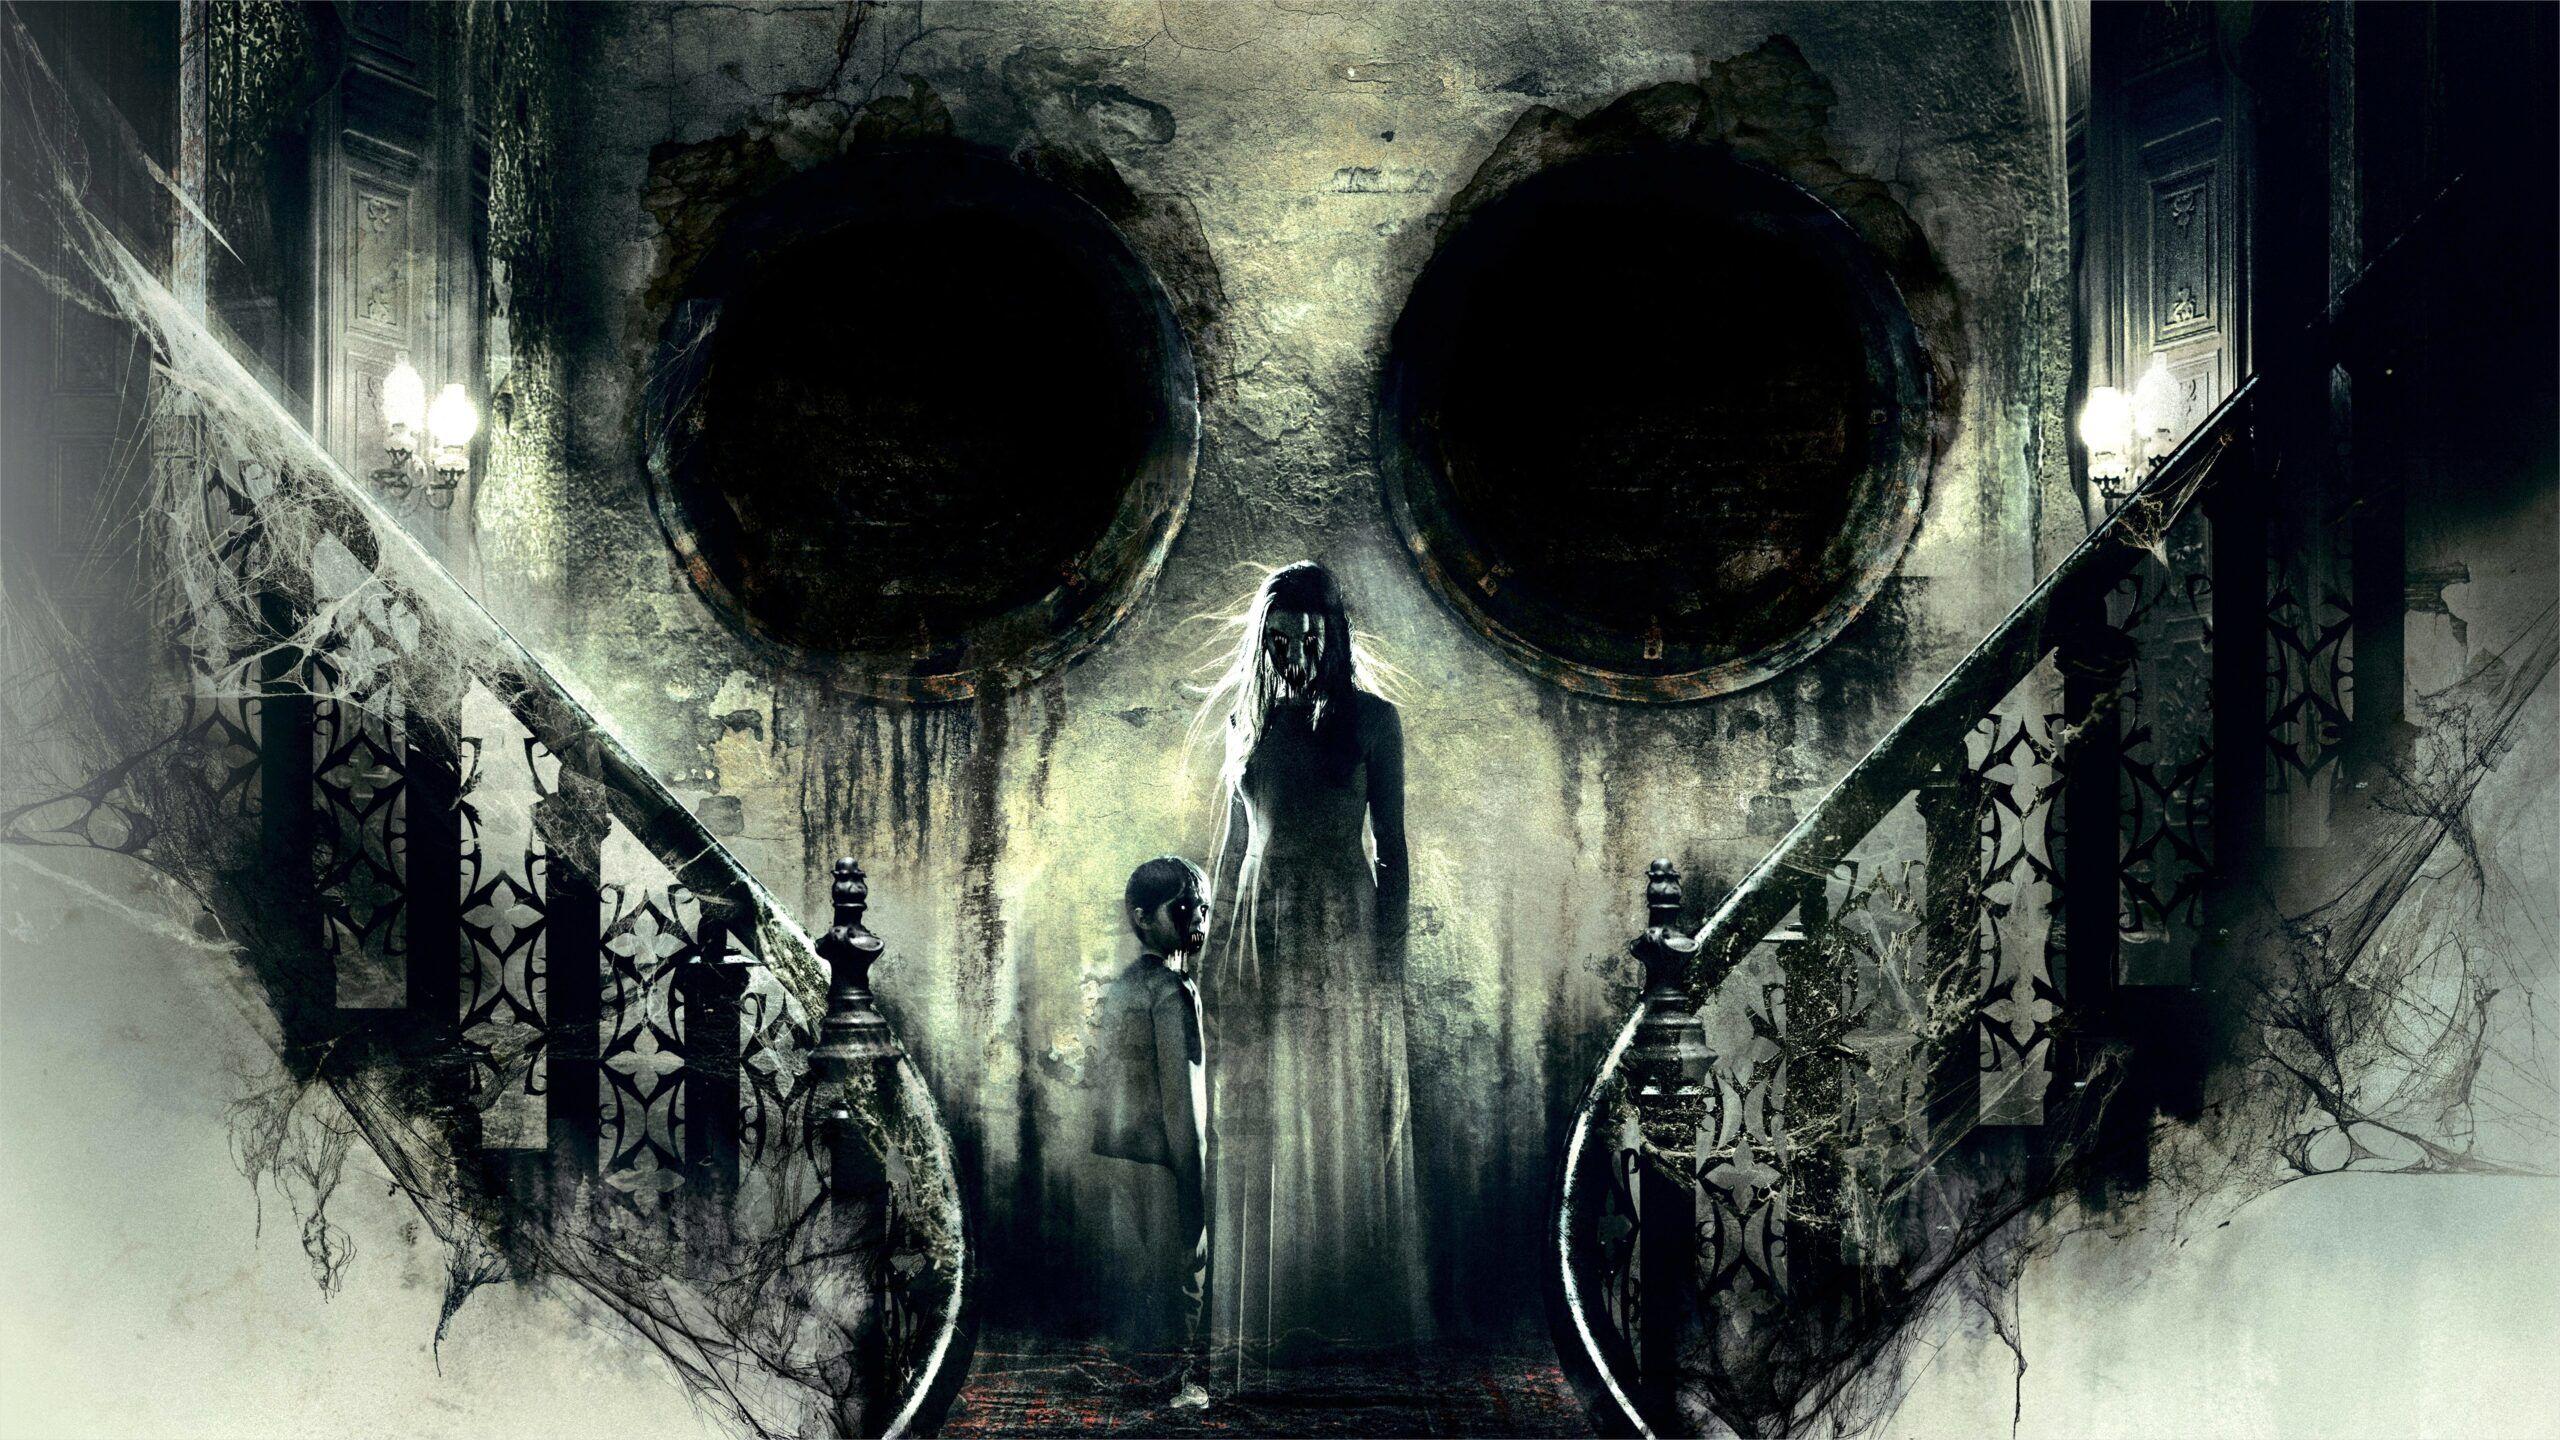 4k Horror Wallpaper Reddit In 2020 Background Hd Wallpaper Horror Hd Wallpaper